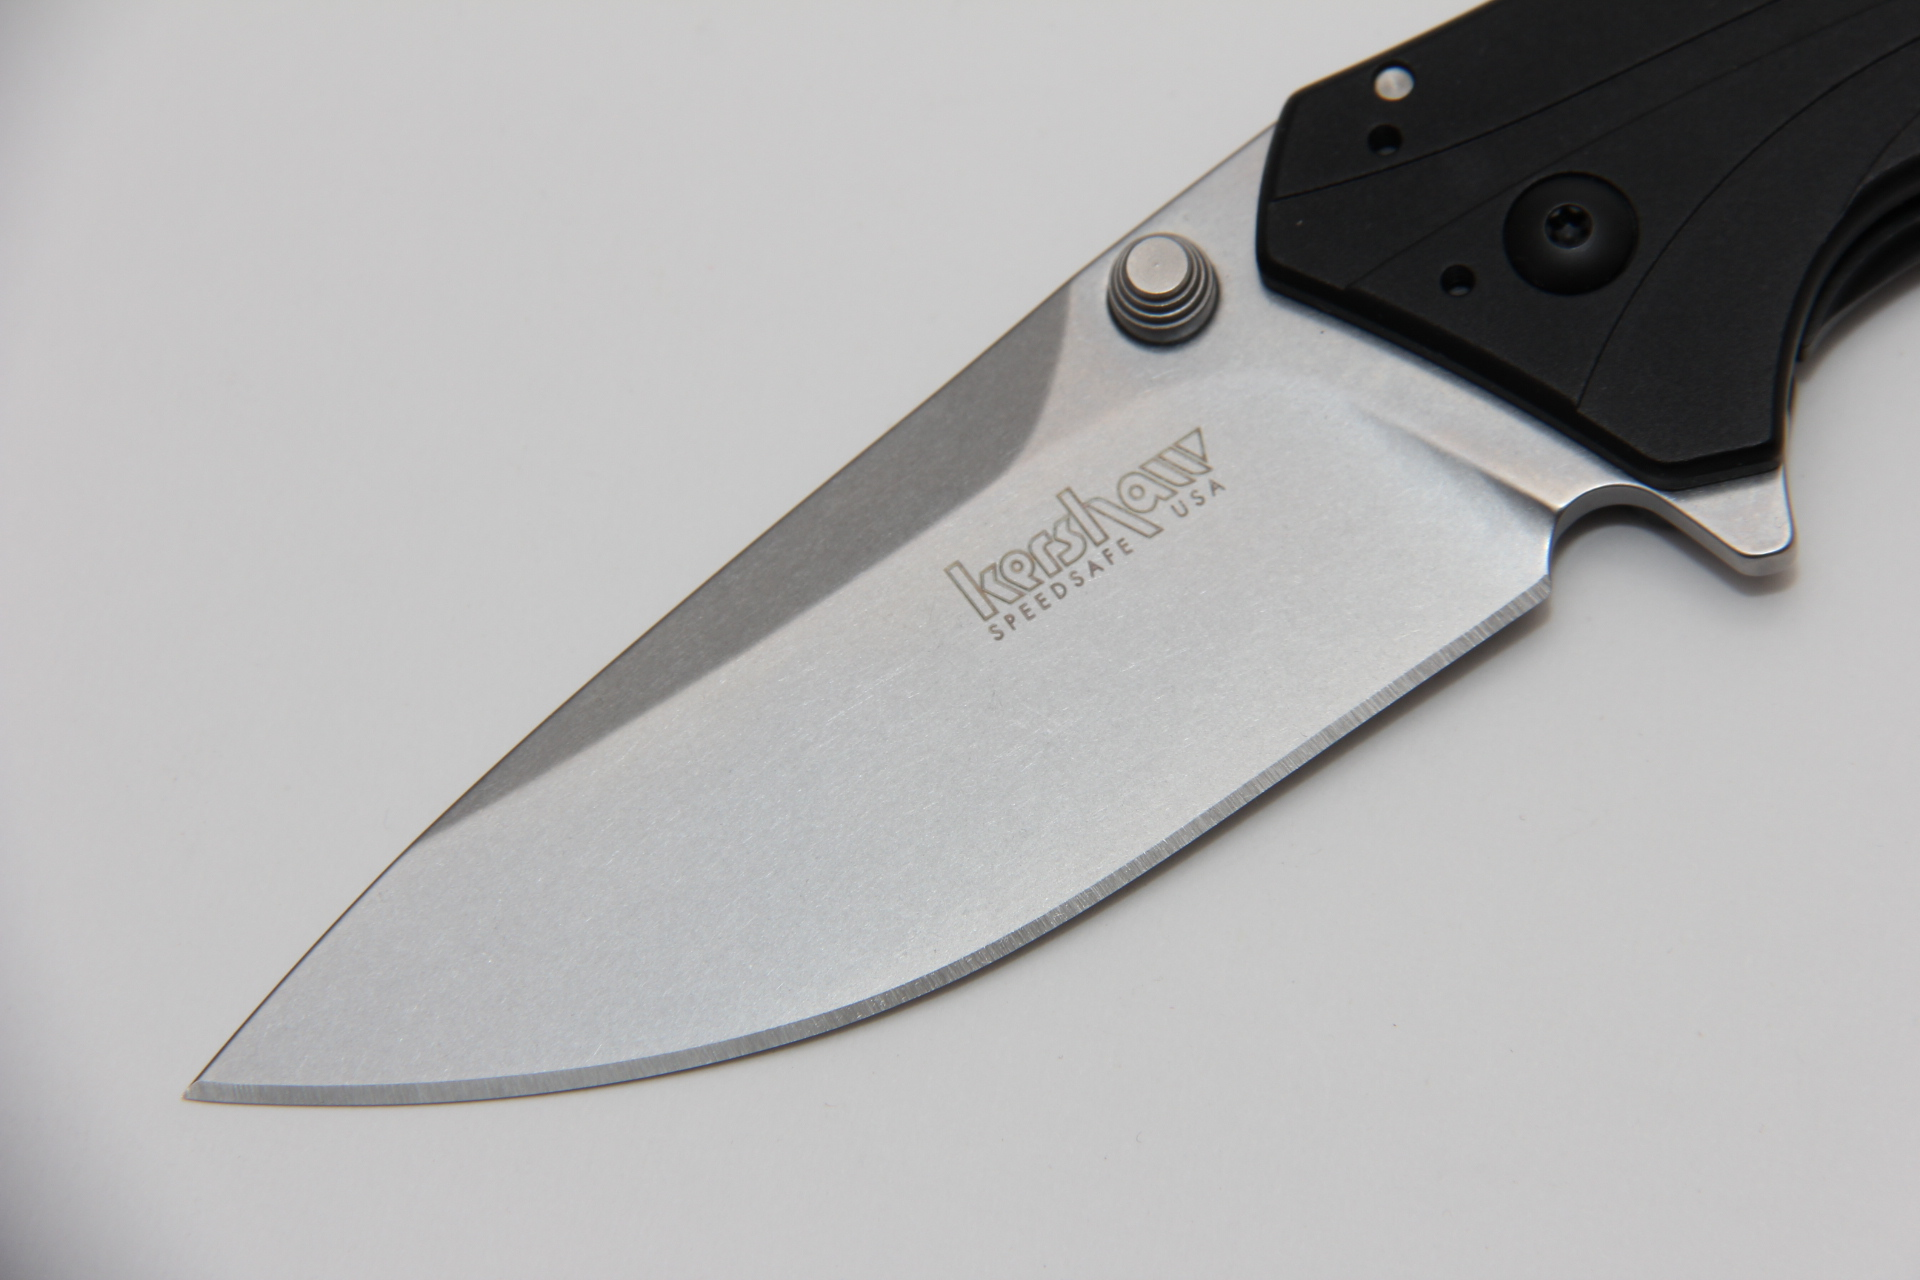 Нож Kershaw Knockout A/O KS1870 - фотография